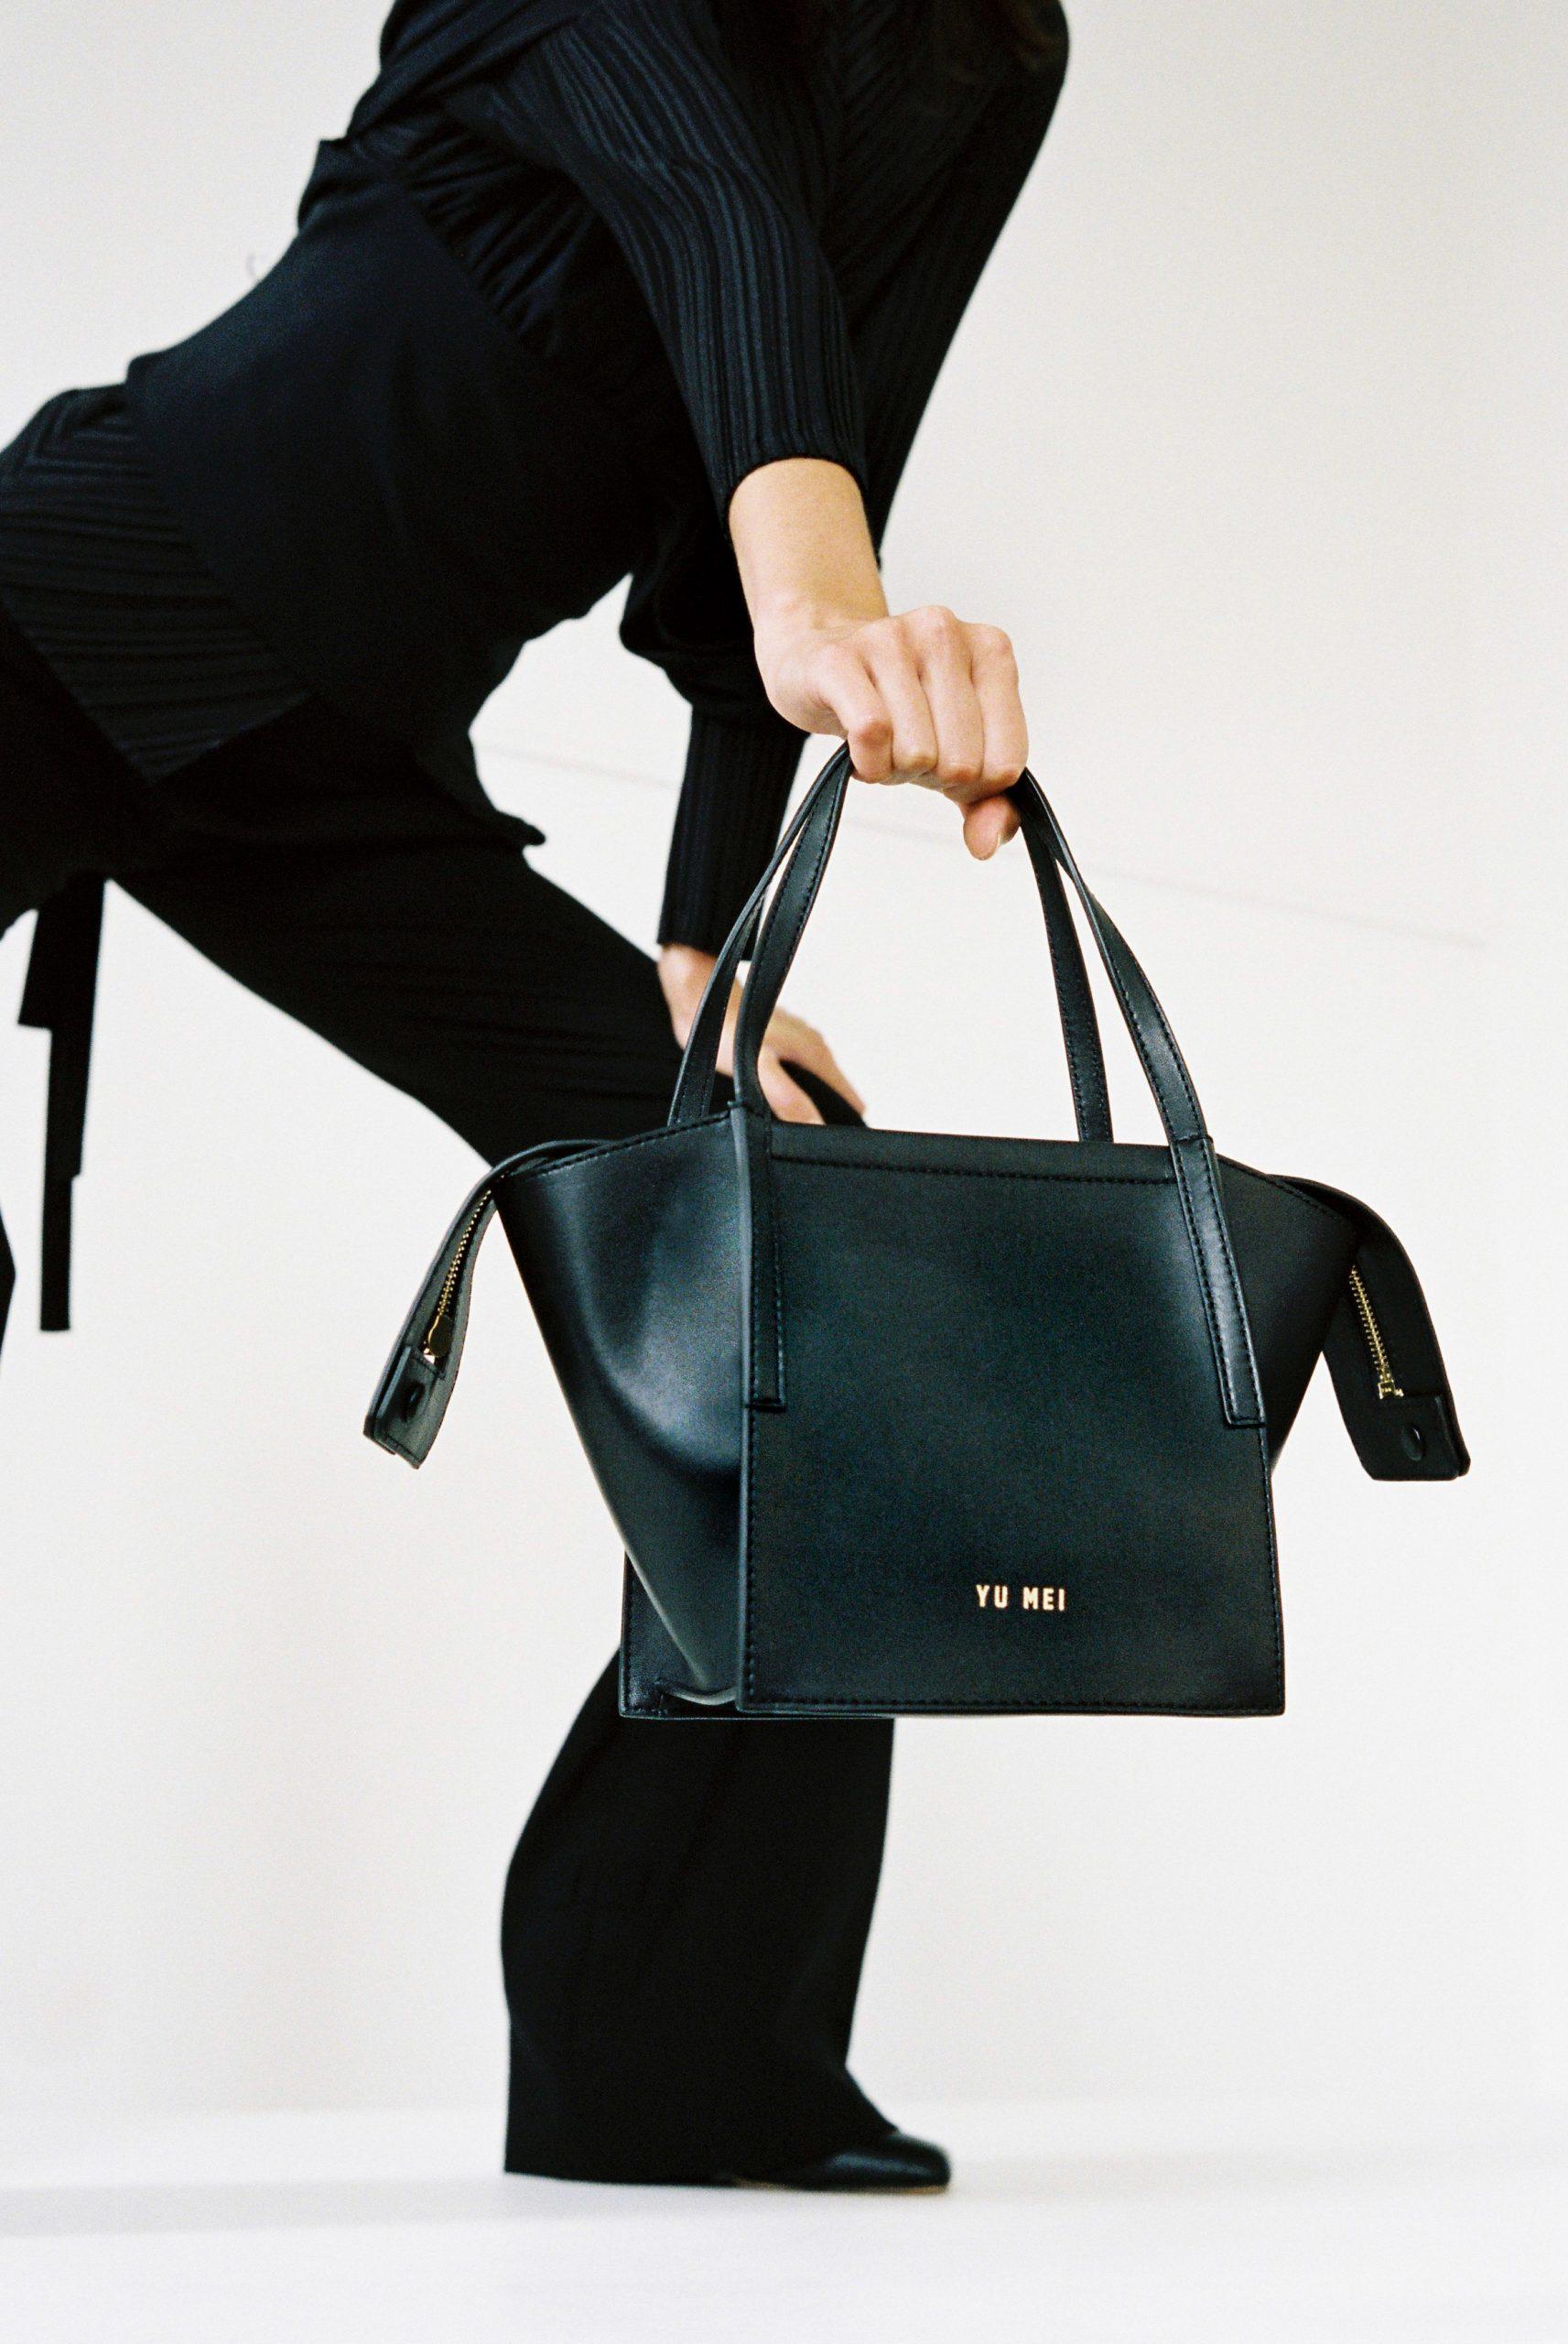 Summer 20 - Black Lamb Milly bag